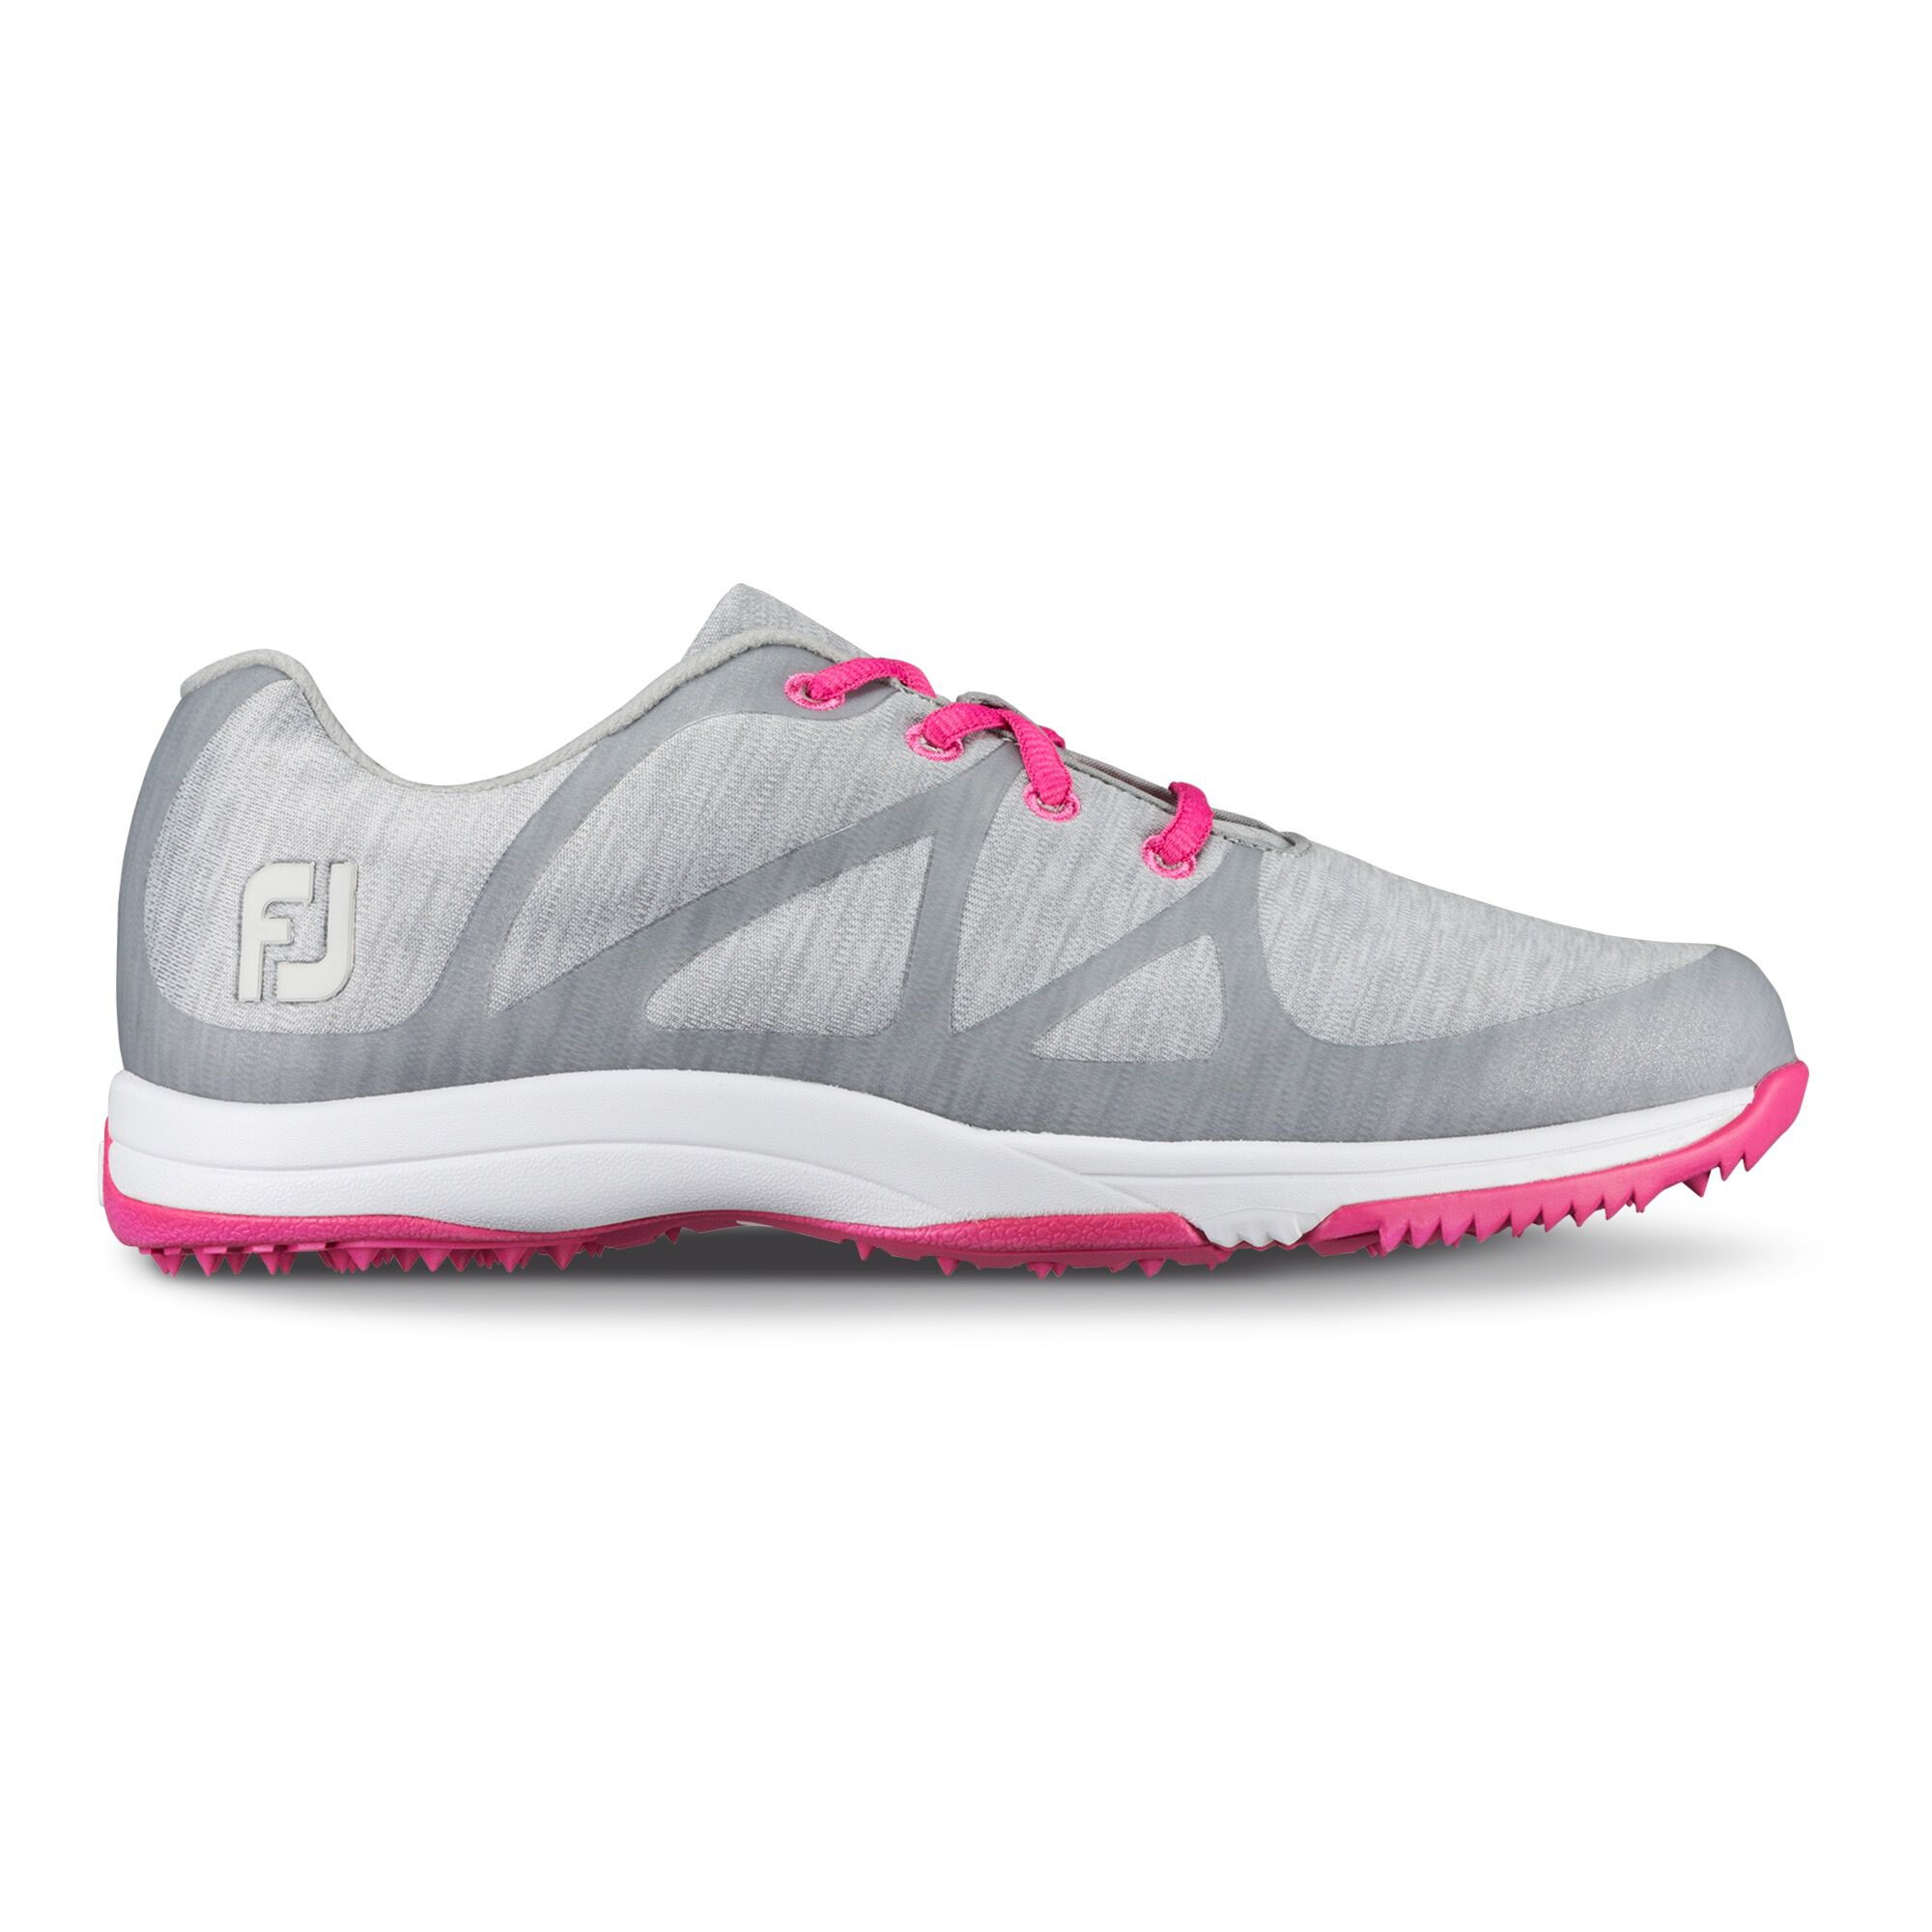 Footjoy Fj Leisure Pink Womens US7.5 IiDllonMt